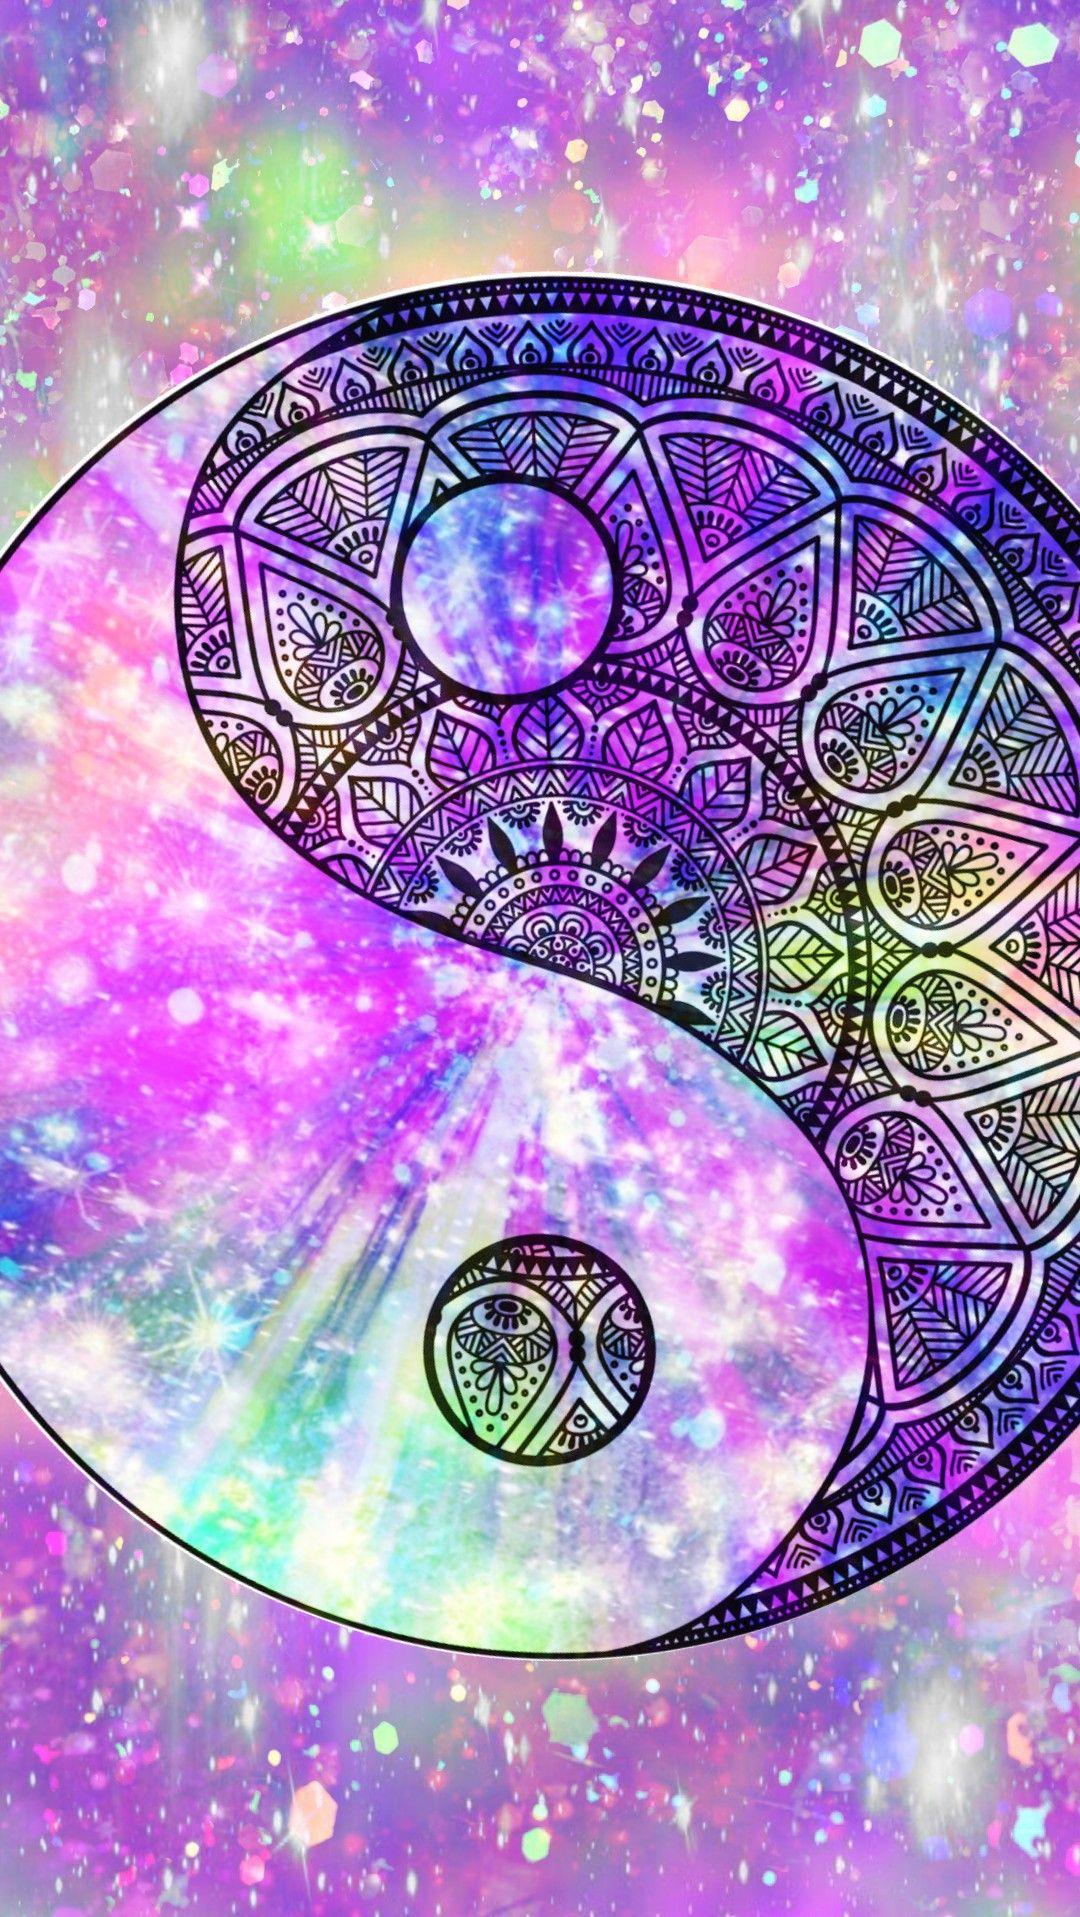 Mandala Yin Yang Galaxy, made by me purple sparkly